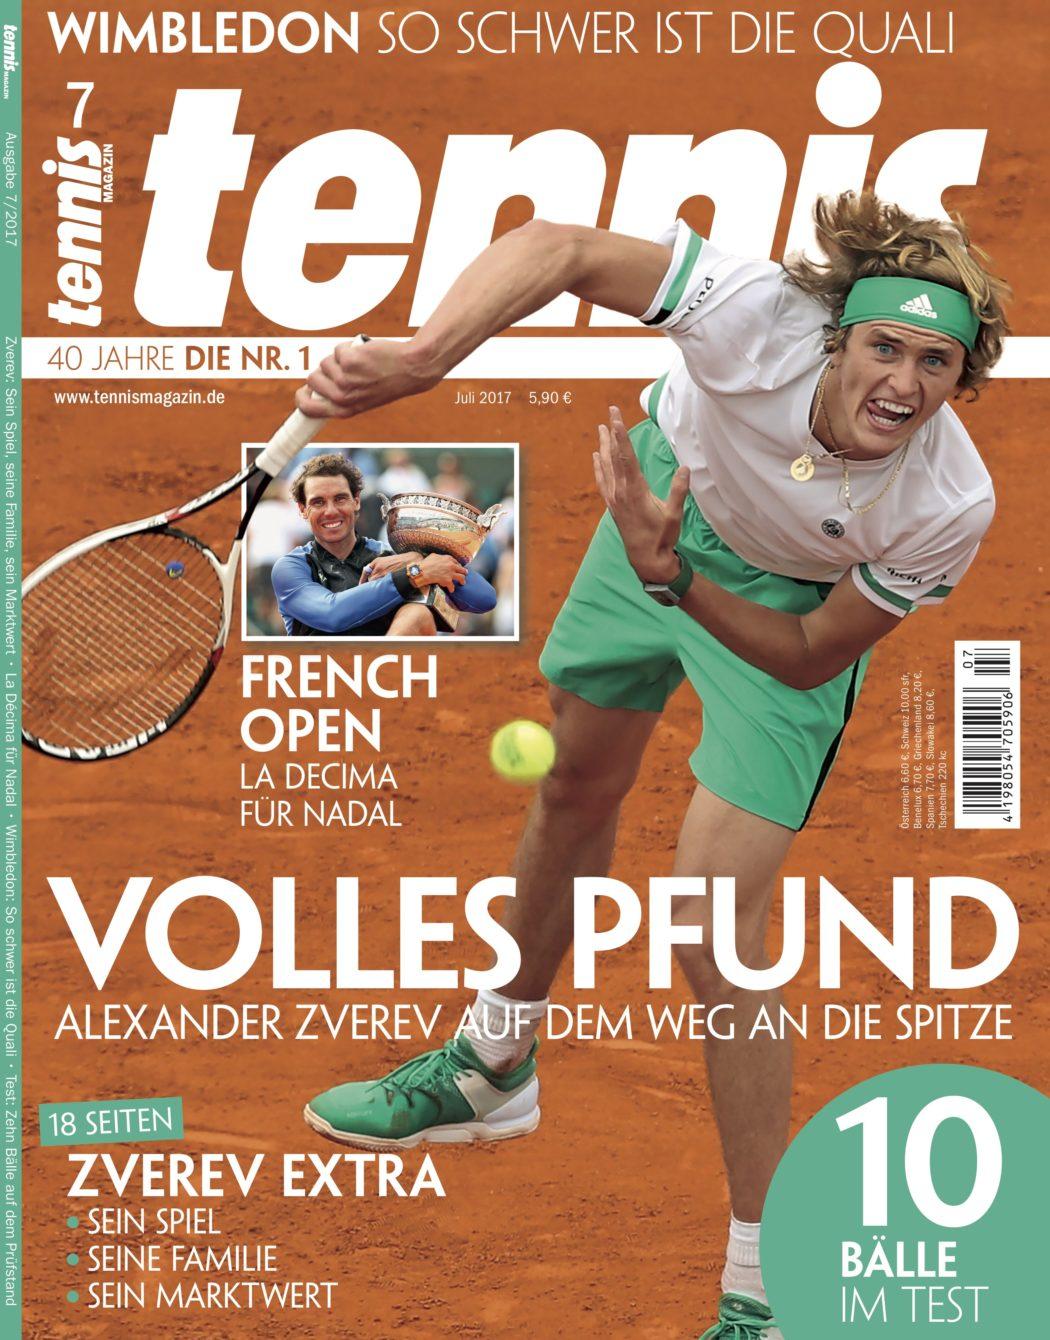 titel7 tennis MAGAZIN